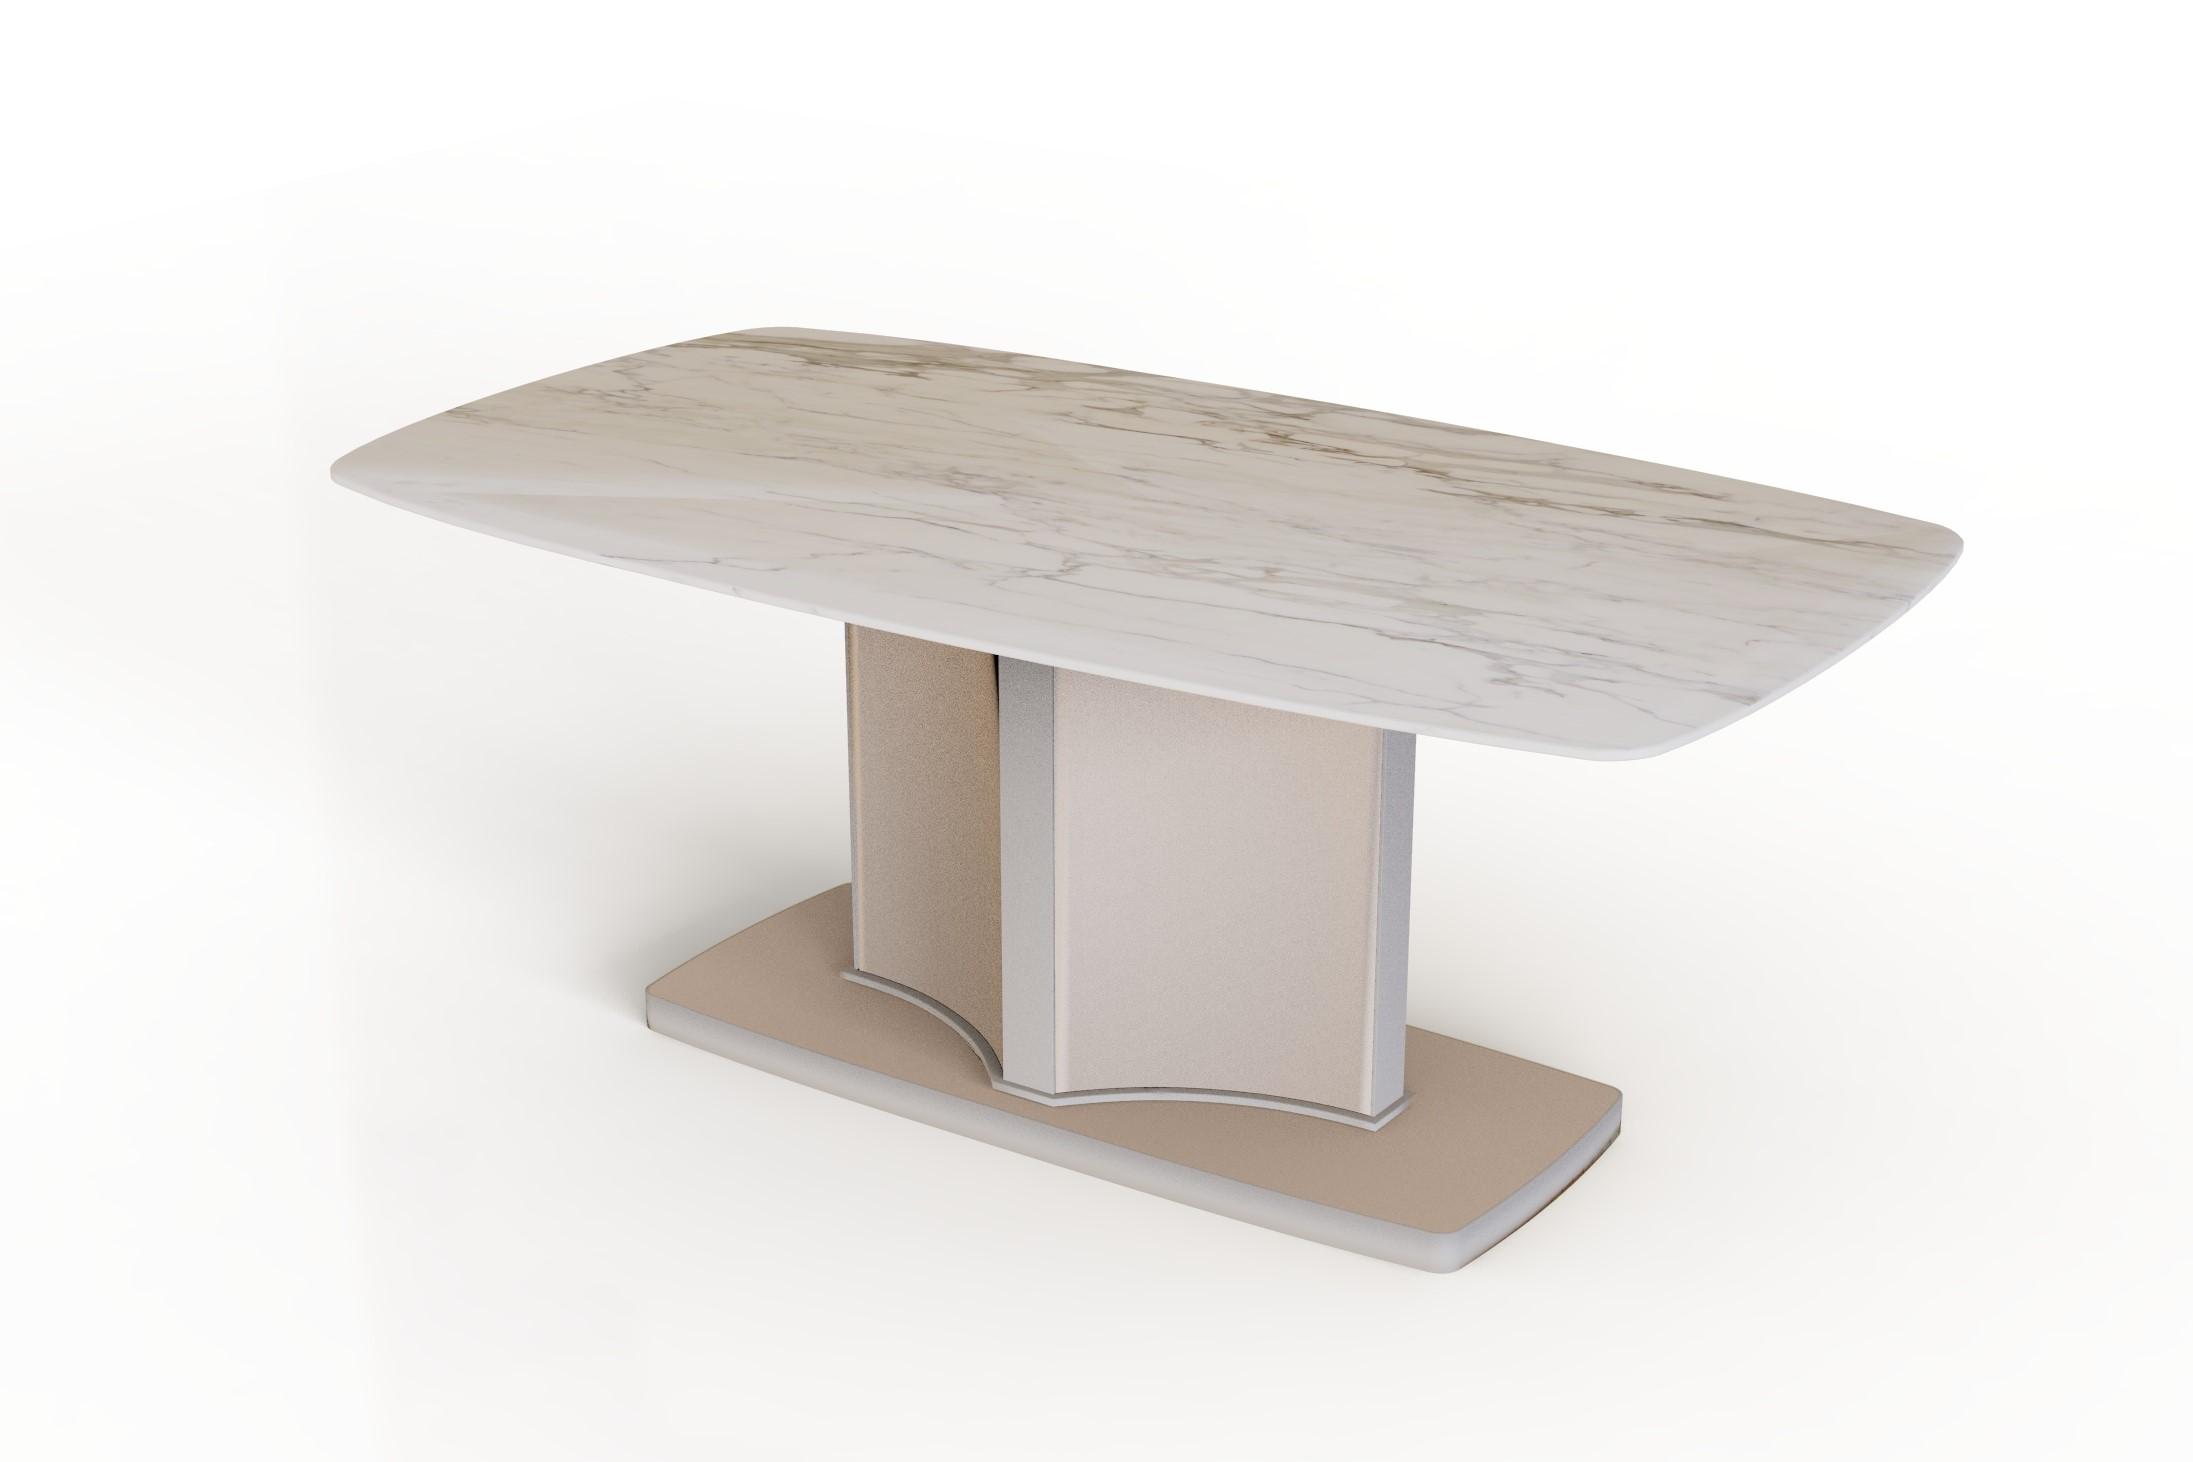 TABLE_7_2_1.jpg